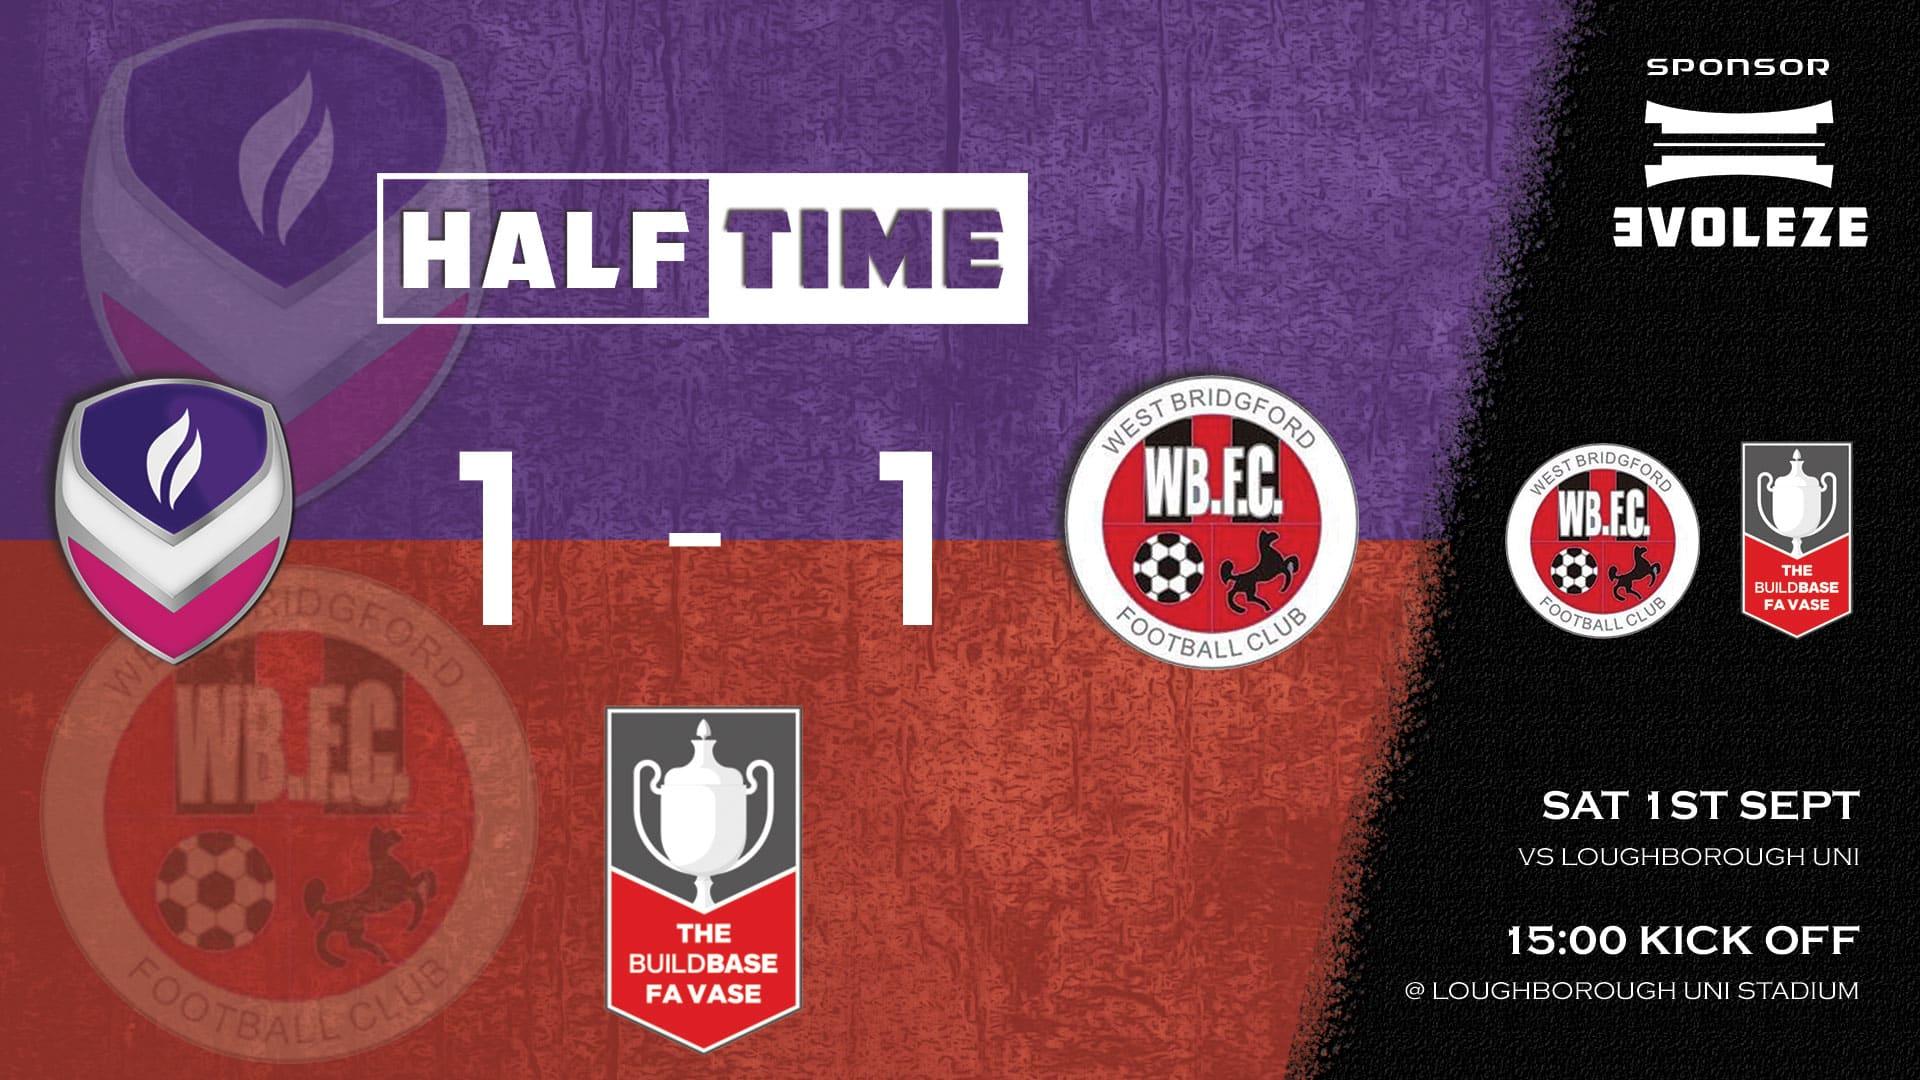 half time - West Bridgford FC